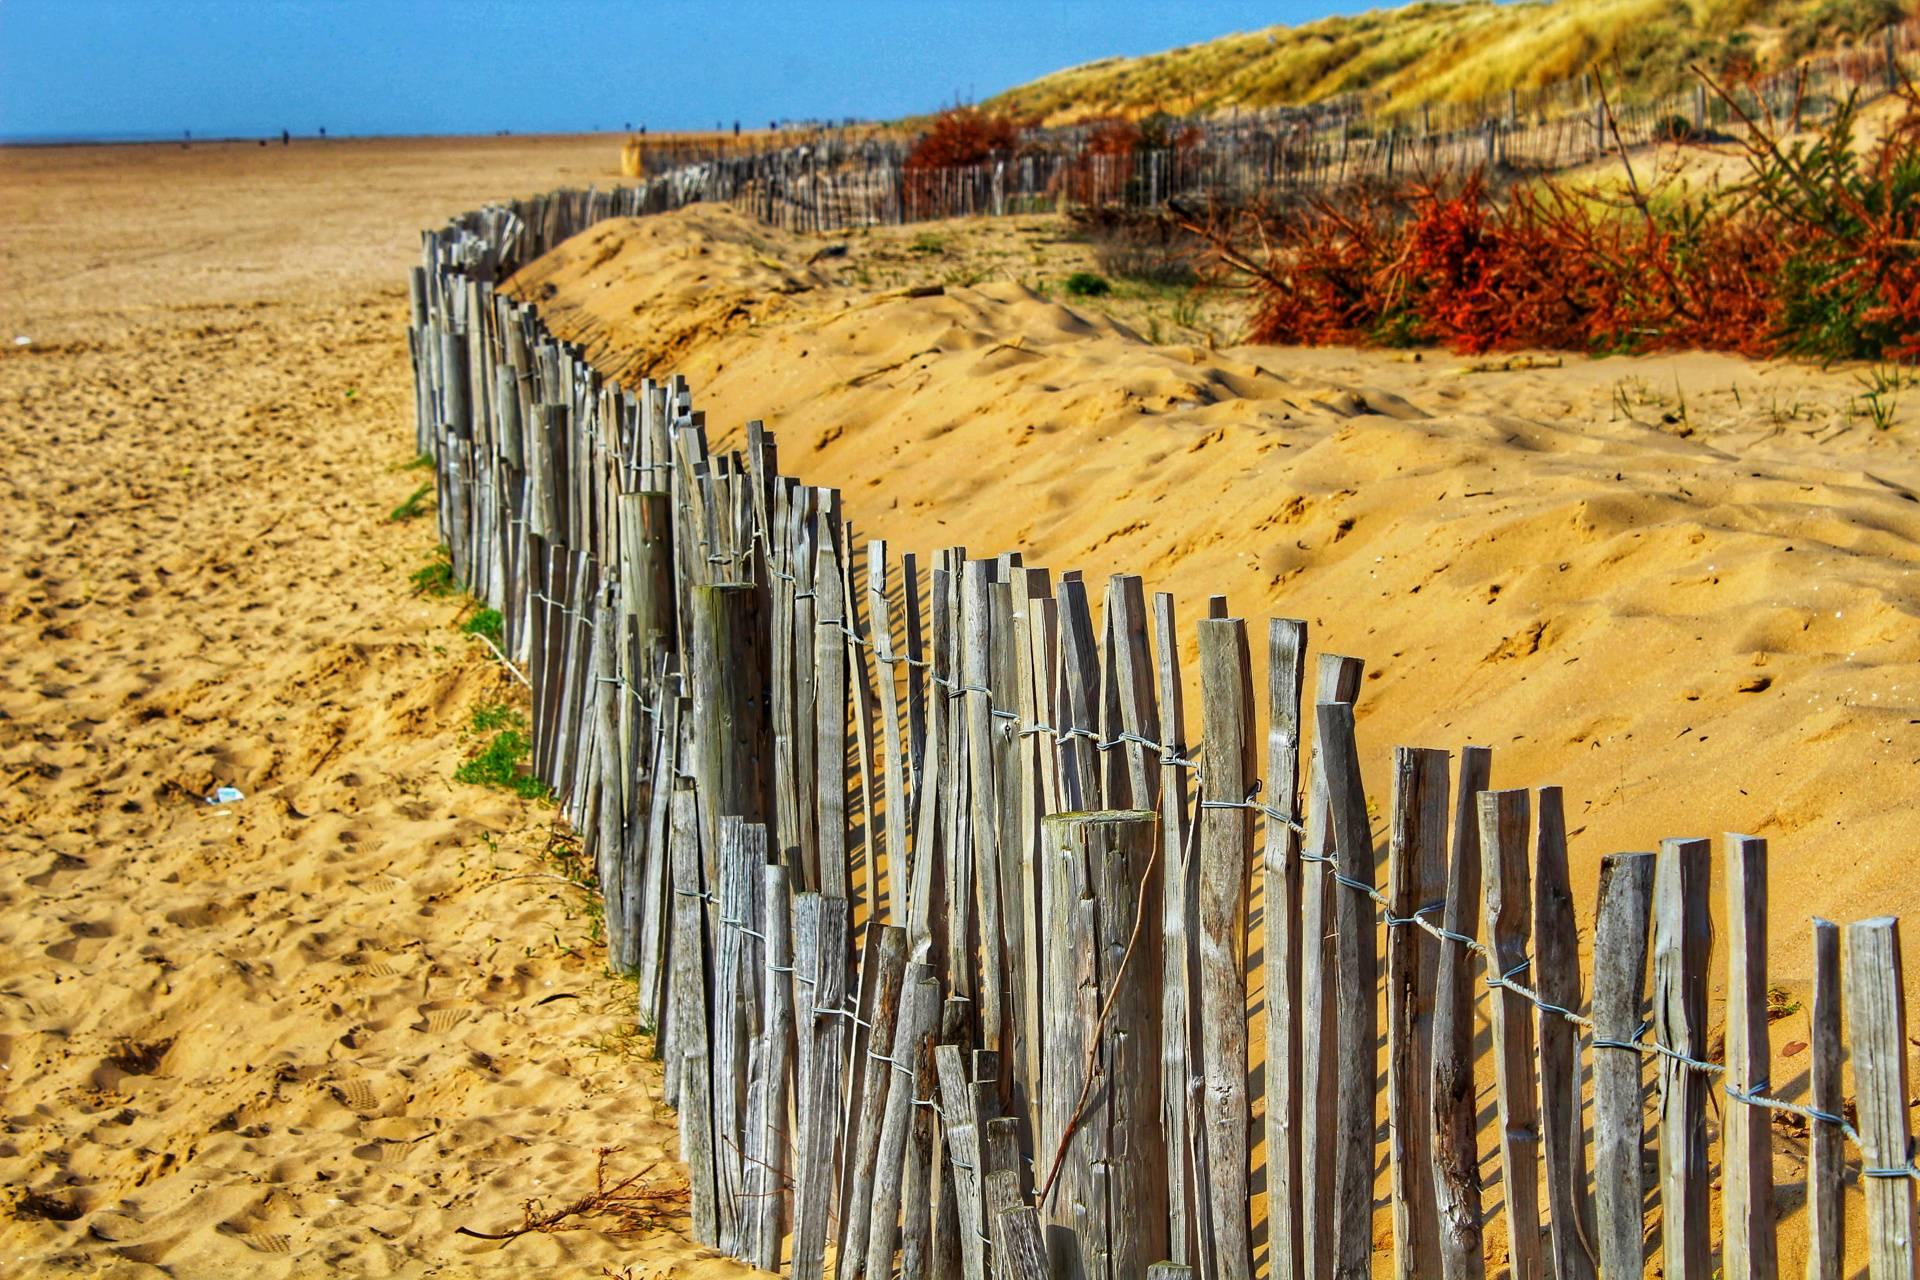 Sandy fence